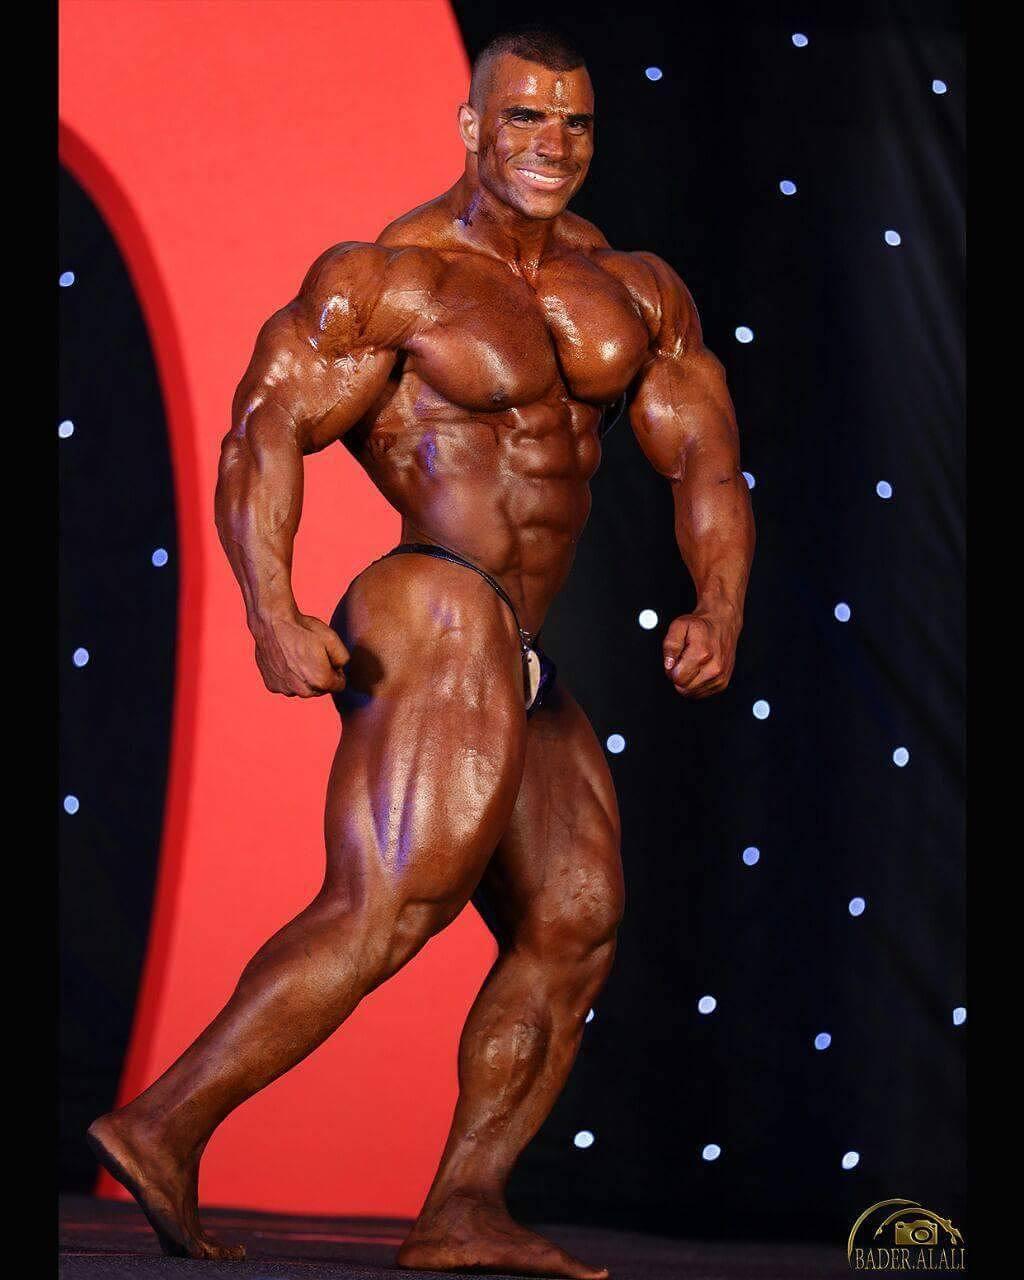 celebrated ifbb pro bodybuilder - HD1024×1280